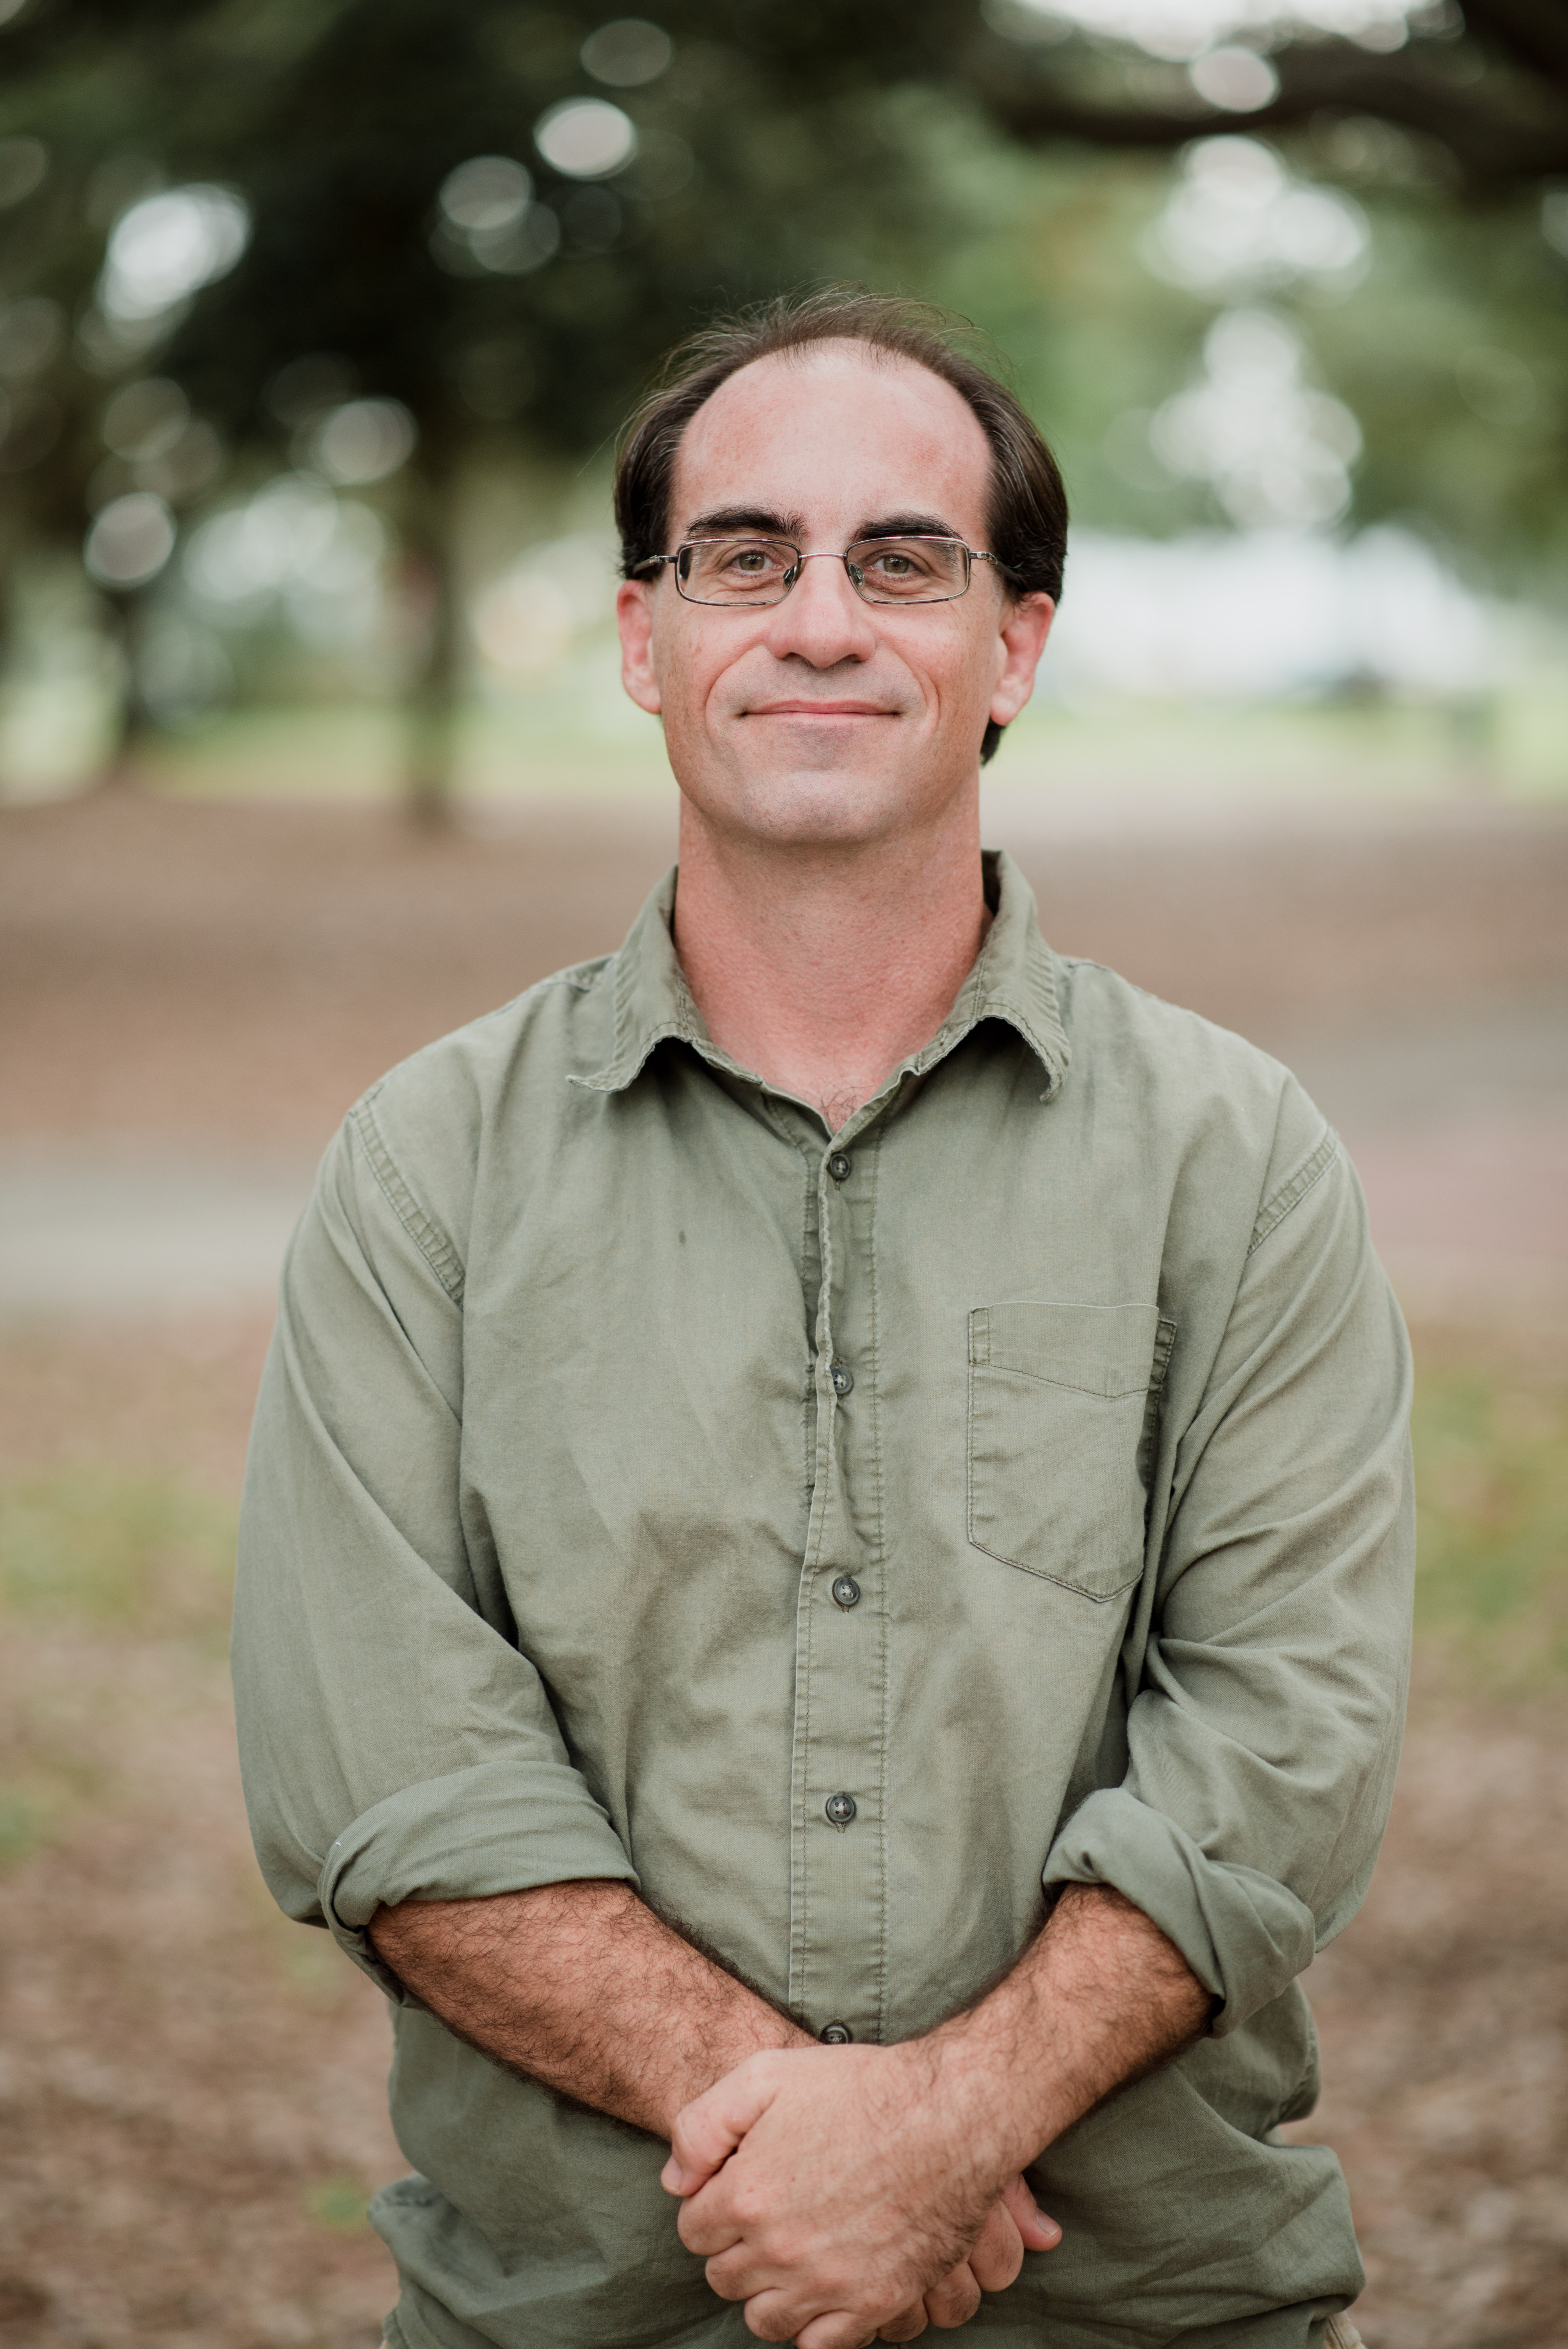 David Cochran